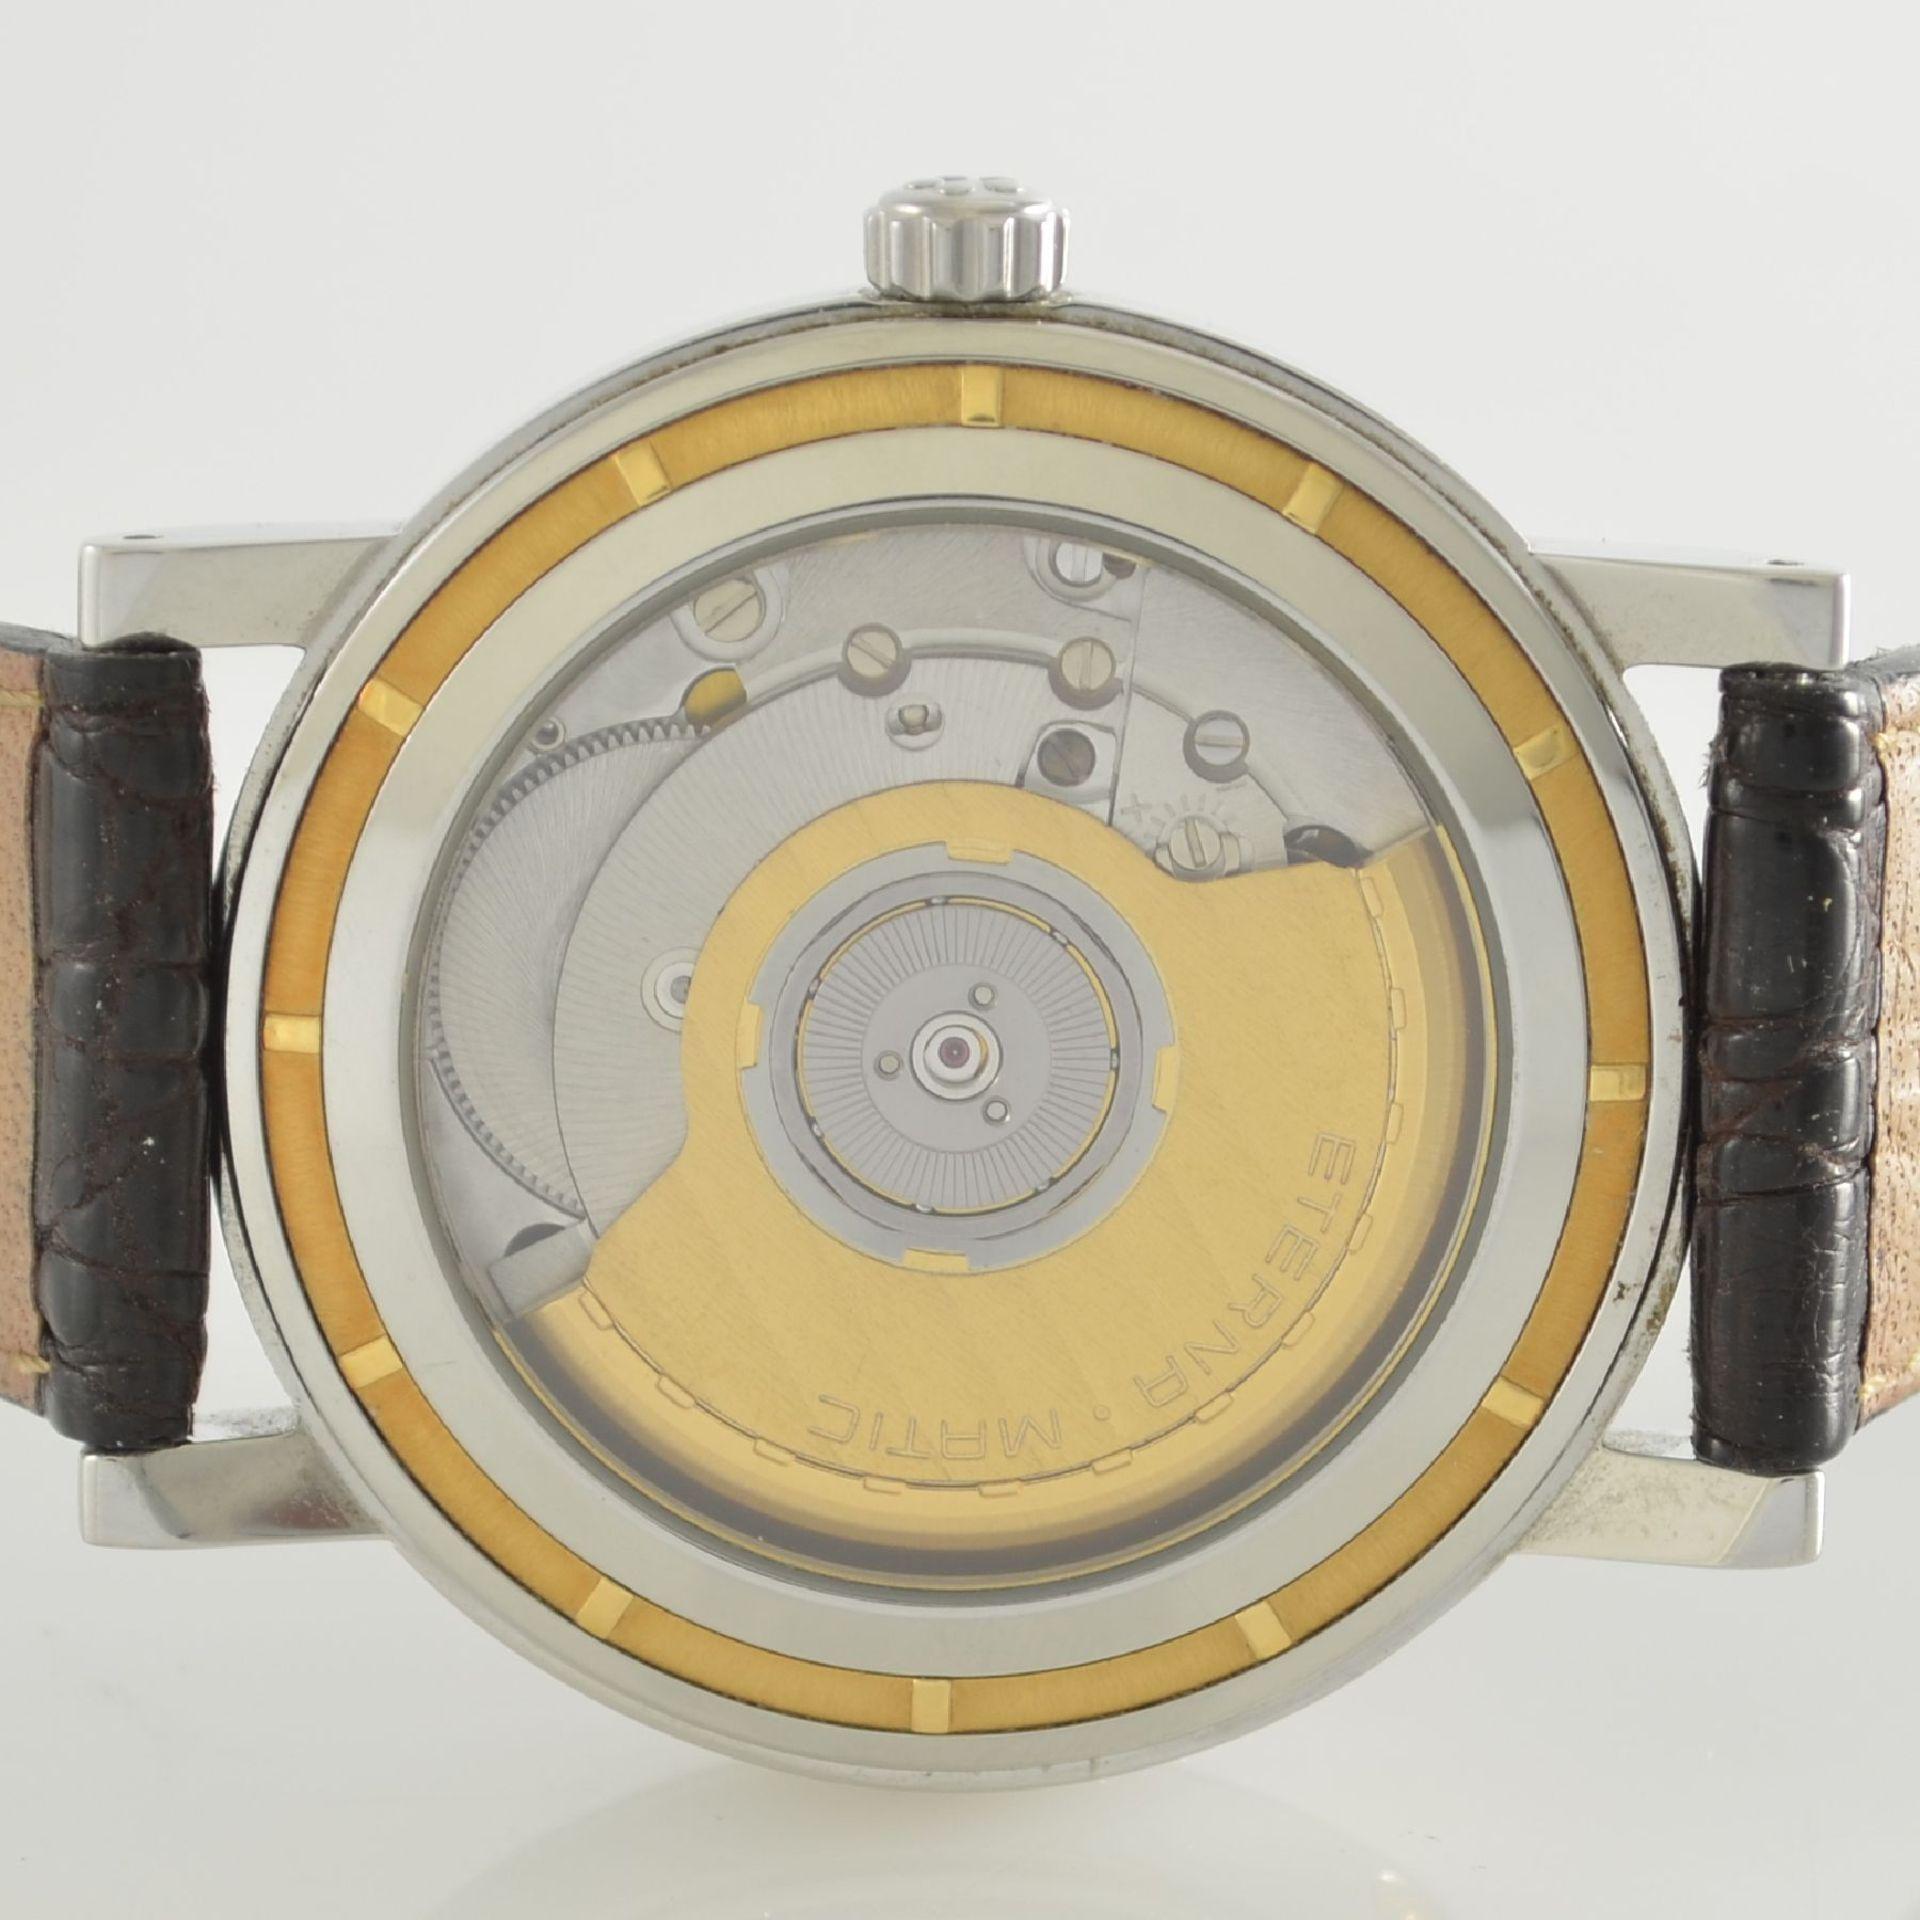 ETERNA-MATIC Herrenarmbanduhr Modell GMT, Automatik, Schweiz um 2000, Edelstahl z. T. verg., - Bild 7 aus 7